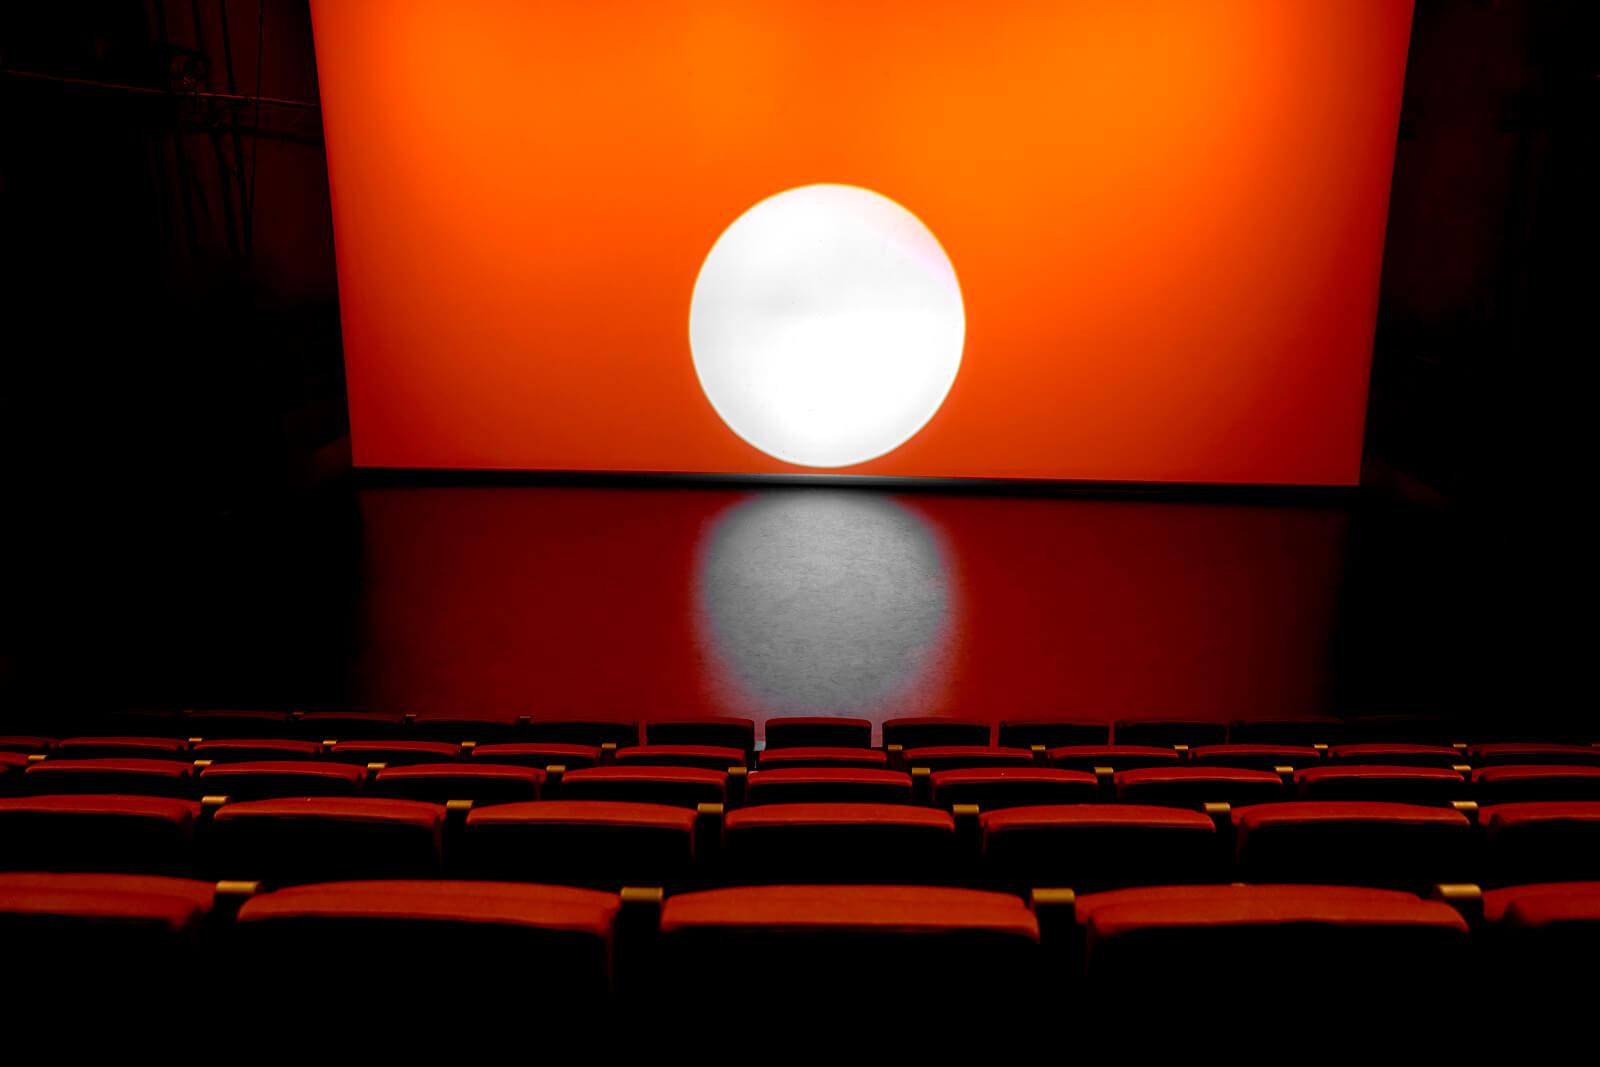 El esp ritu del teatro en madrid sala mirador for Sala mirador